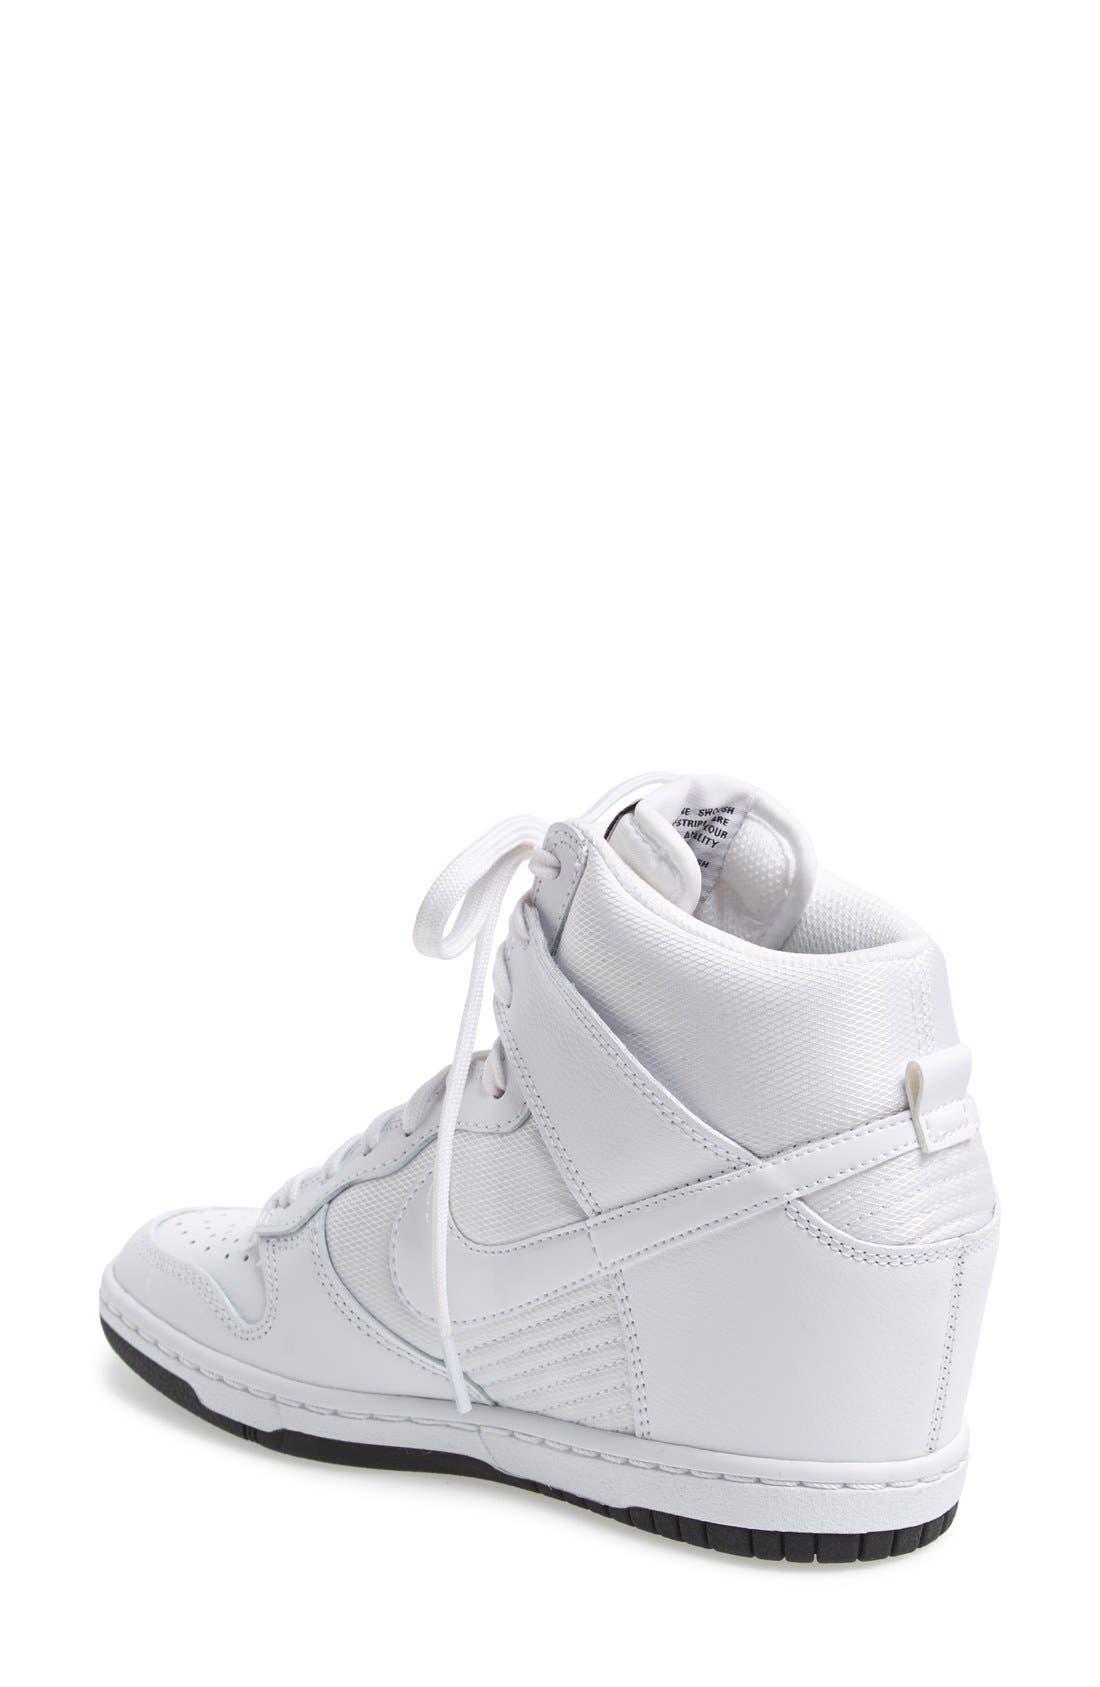 ,                             'Dunk Sky Hi - Essential' Wedge Sneaker,                             Alternate thumbnail 39, color,                             101